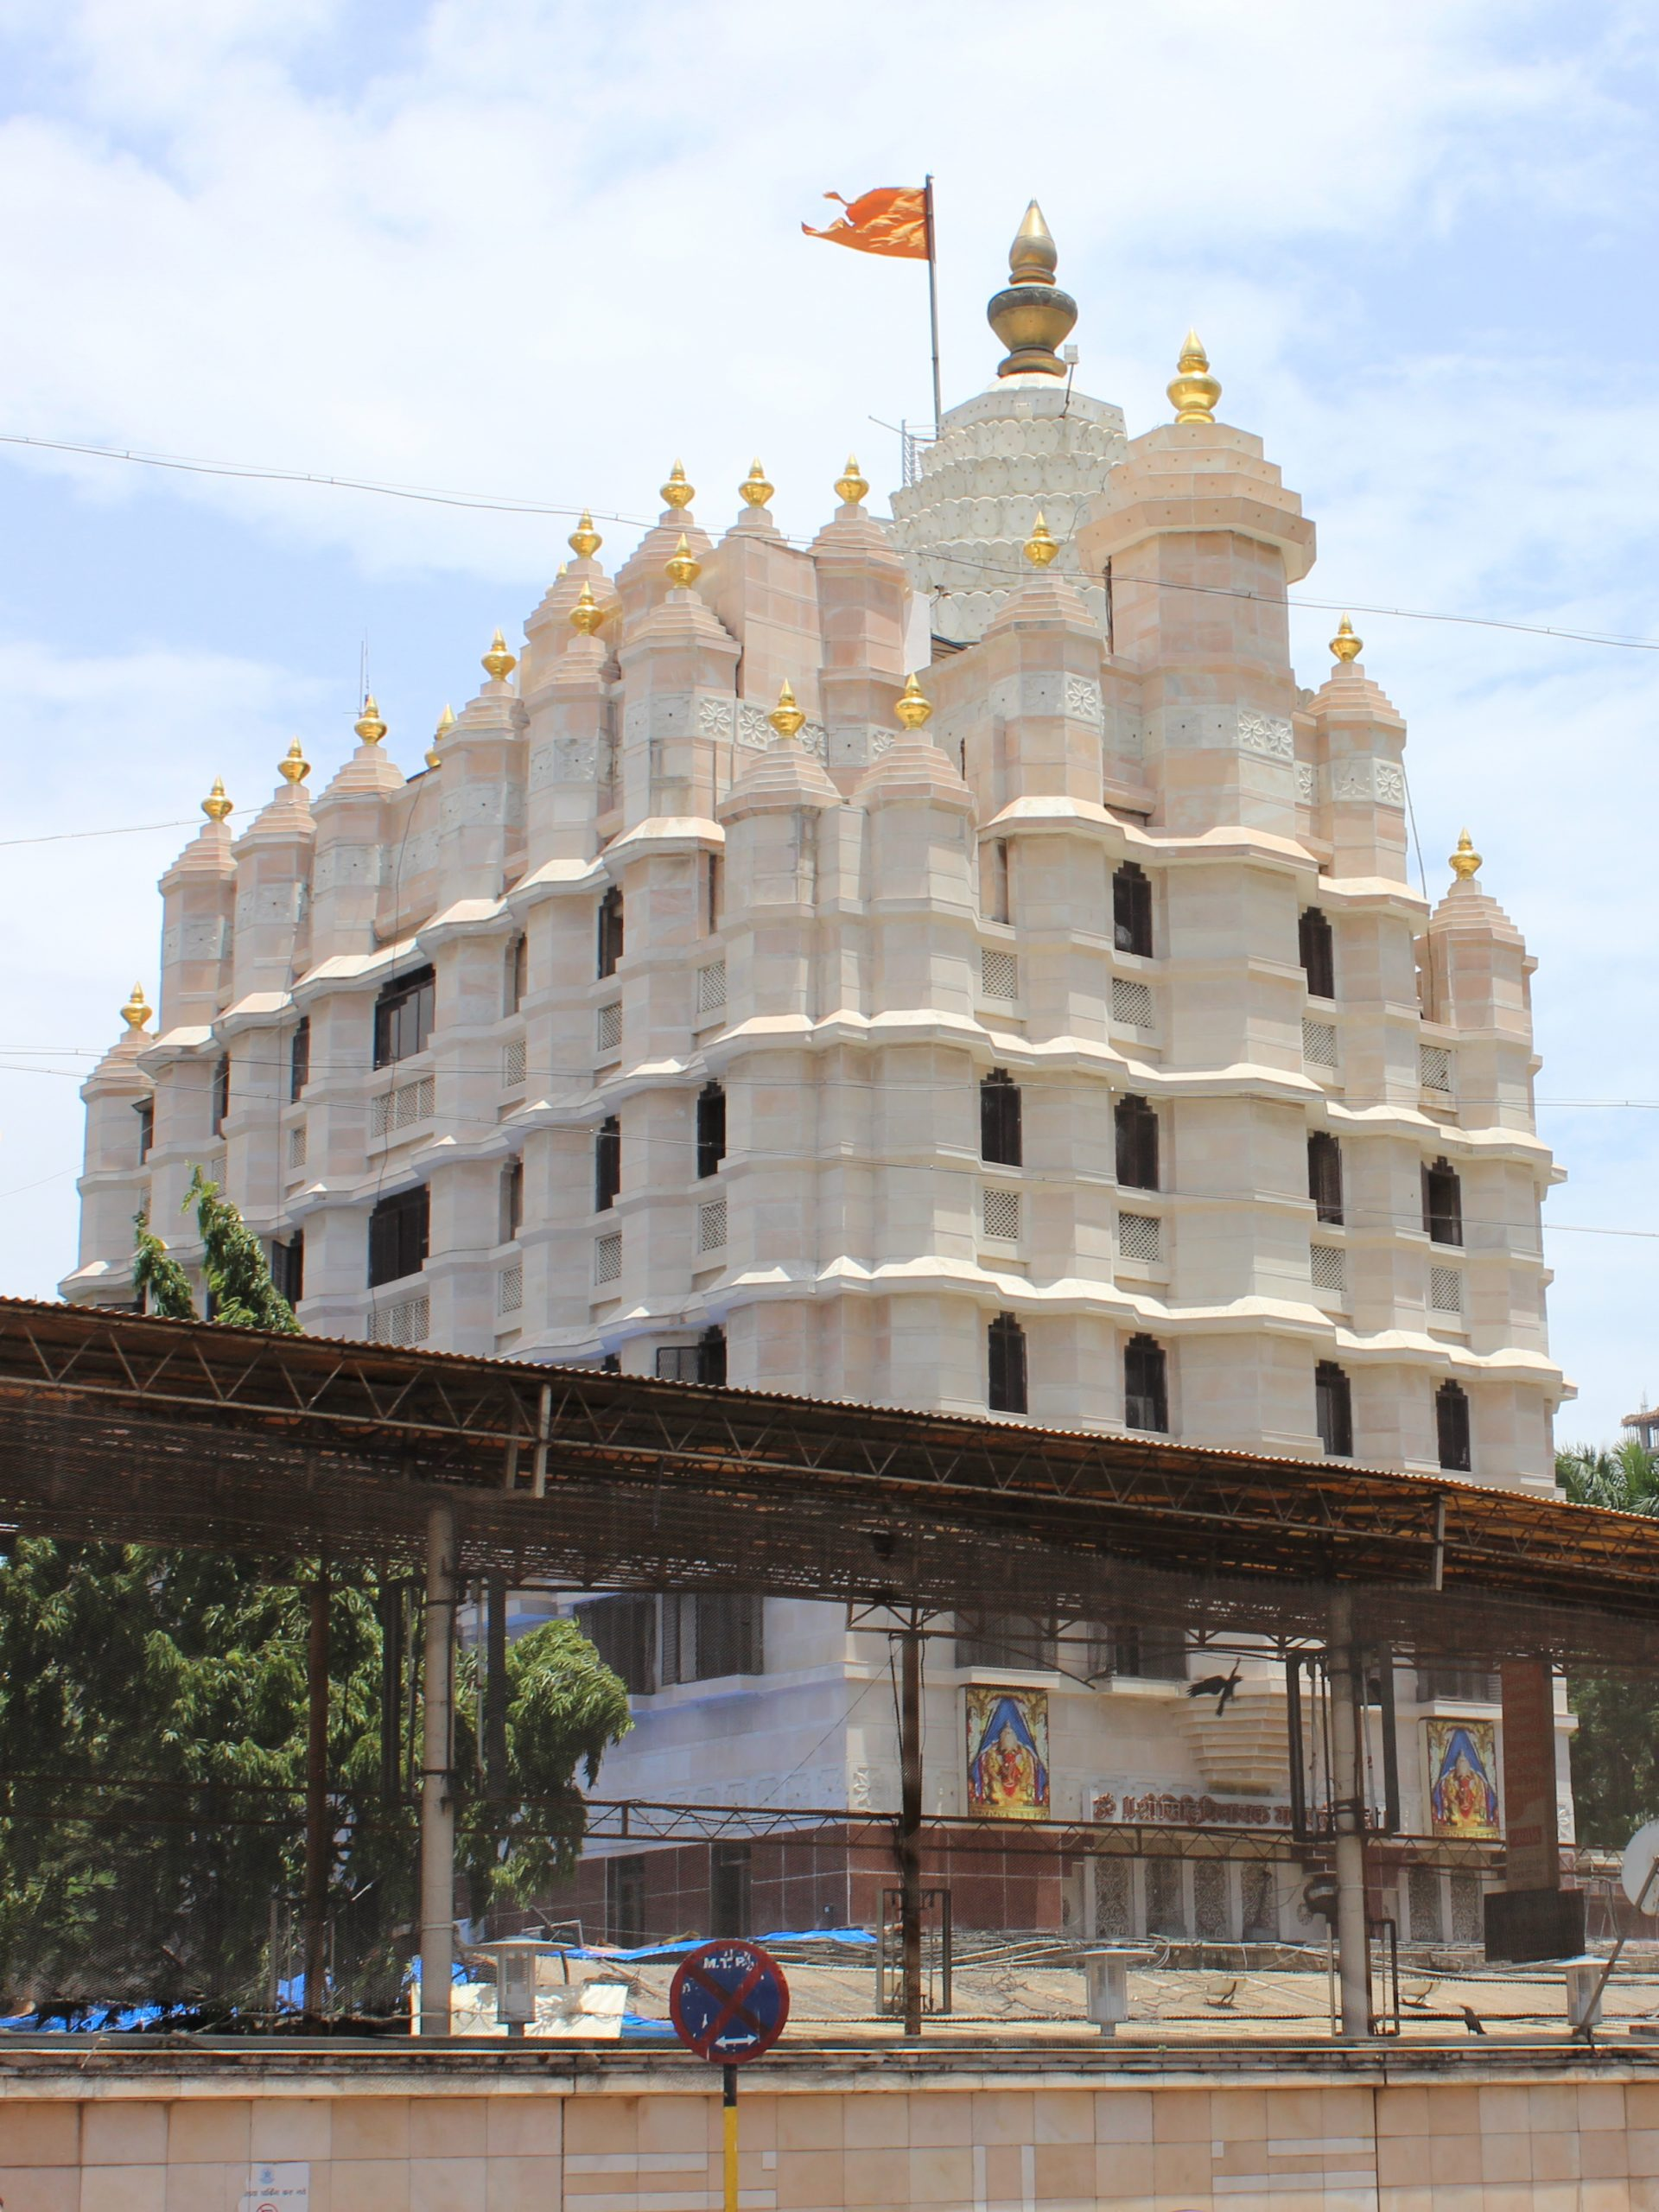 Siddhivinayaka Temple Must-Visit Places When in Mumbai